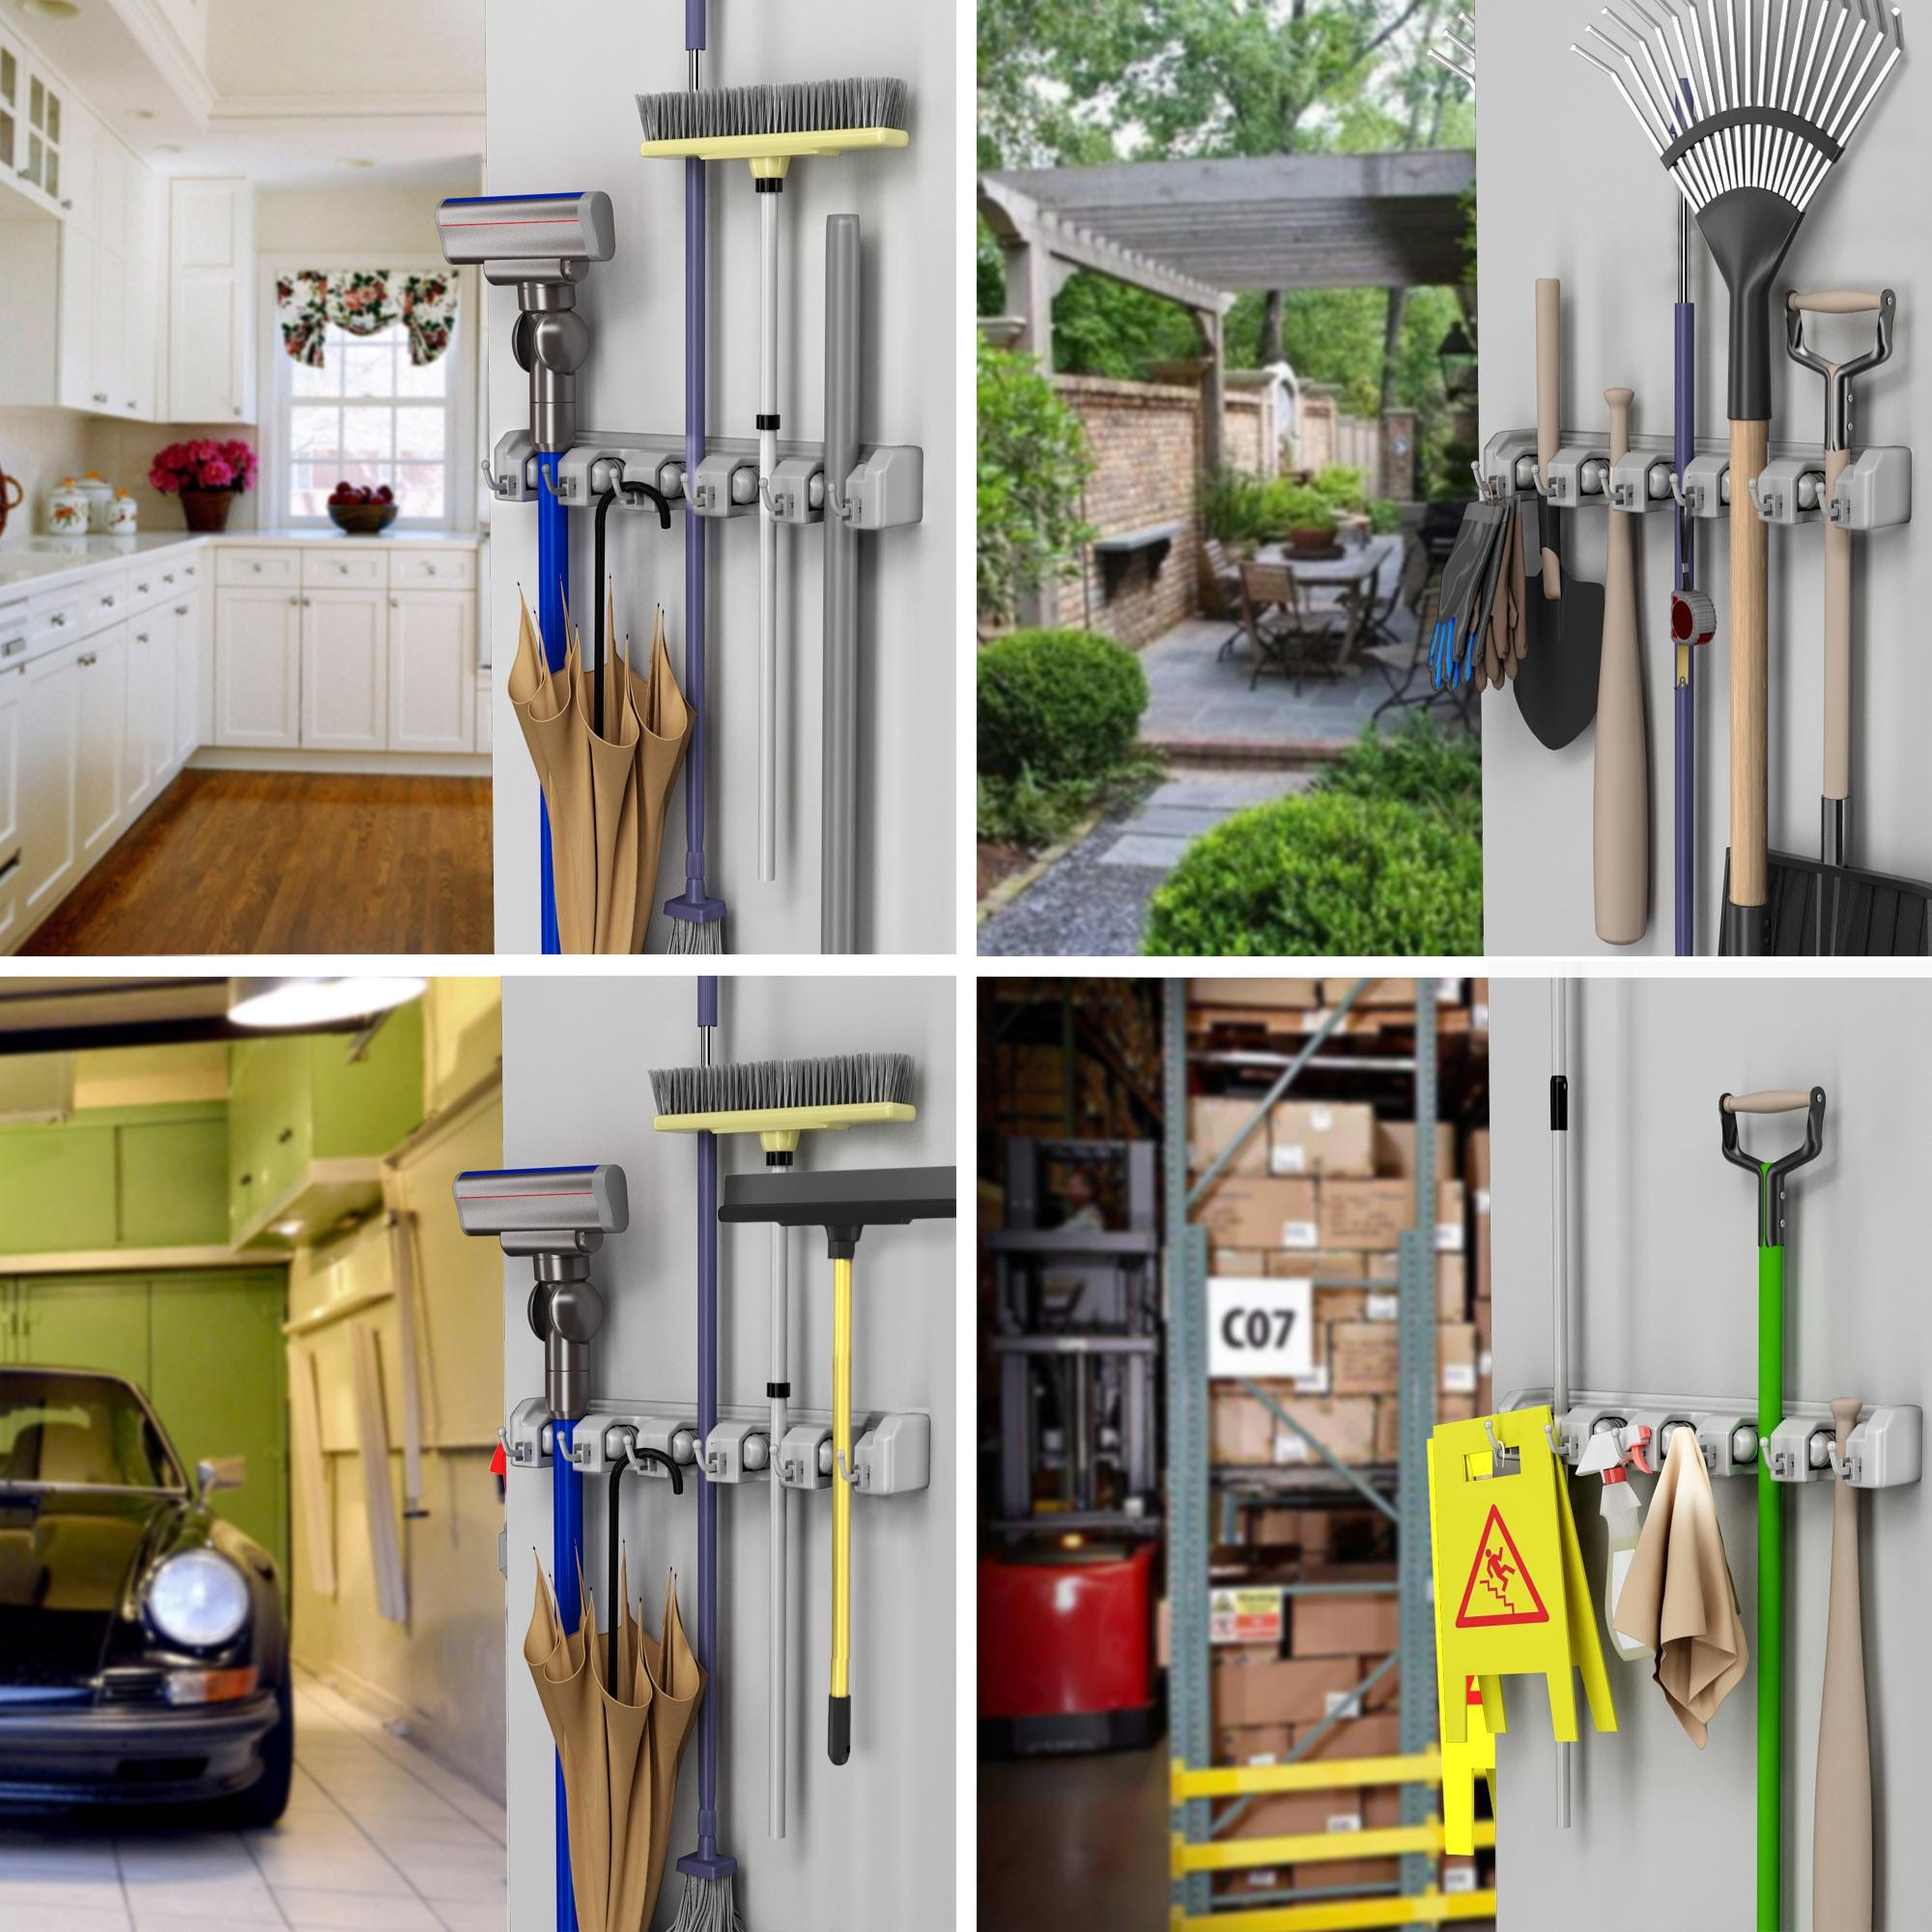 Shop Shovel, Rake and Tool Holder with Hooks- Wall Mounted Organizer ...